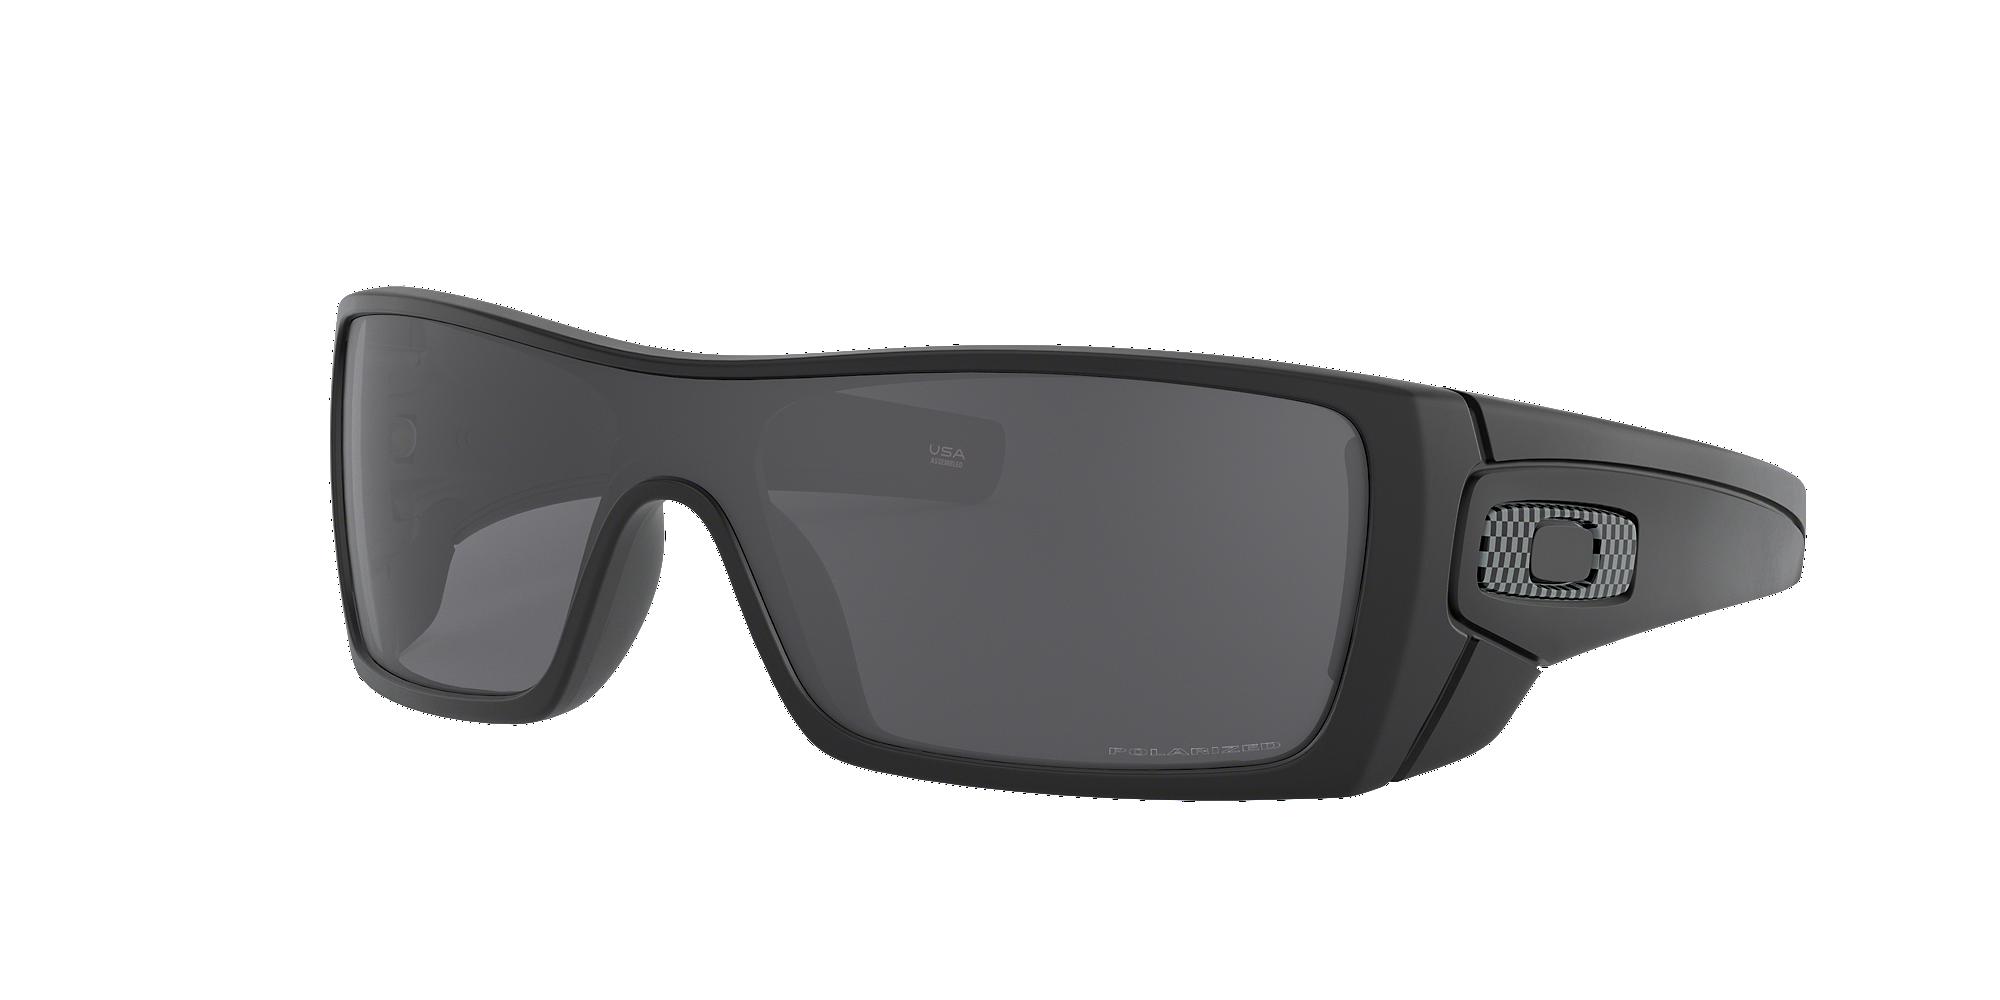 Oakley Prescription Glasses Nz